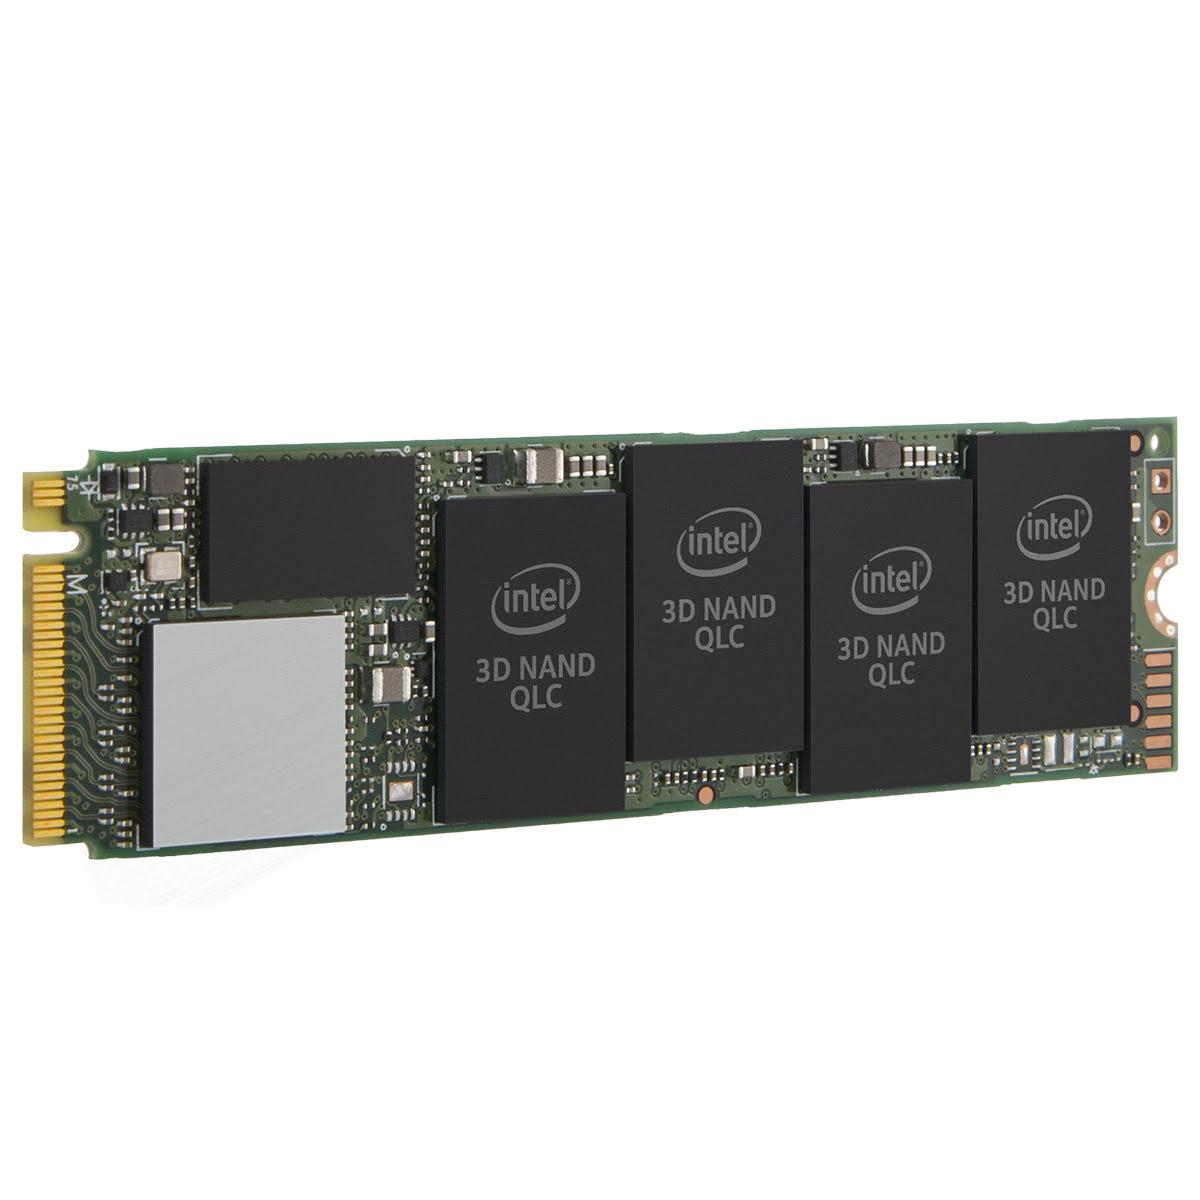 Intel 660P 480-525Go M.2 - Disque SSD Intel - Cybertek.fr - 2